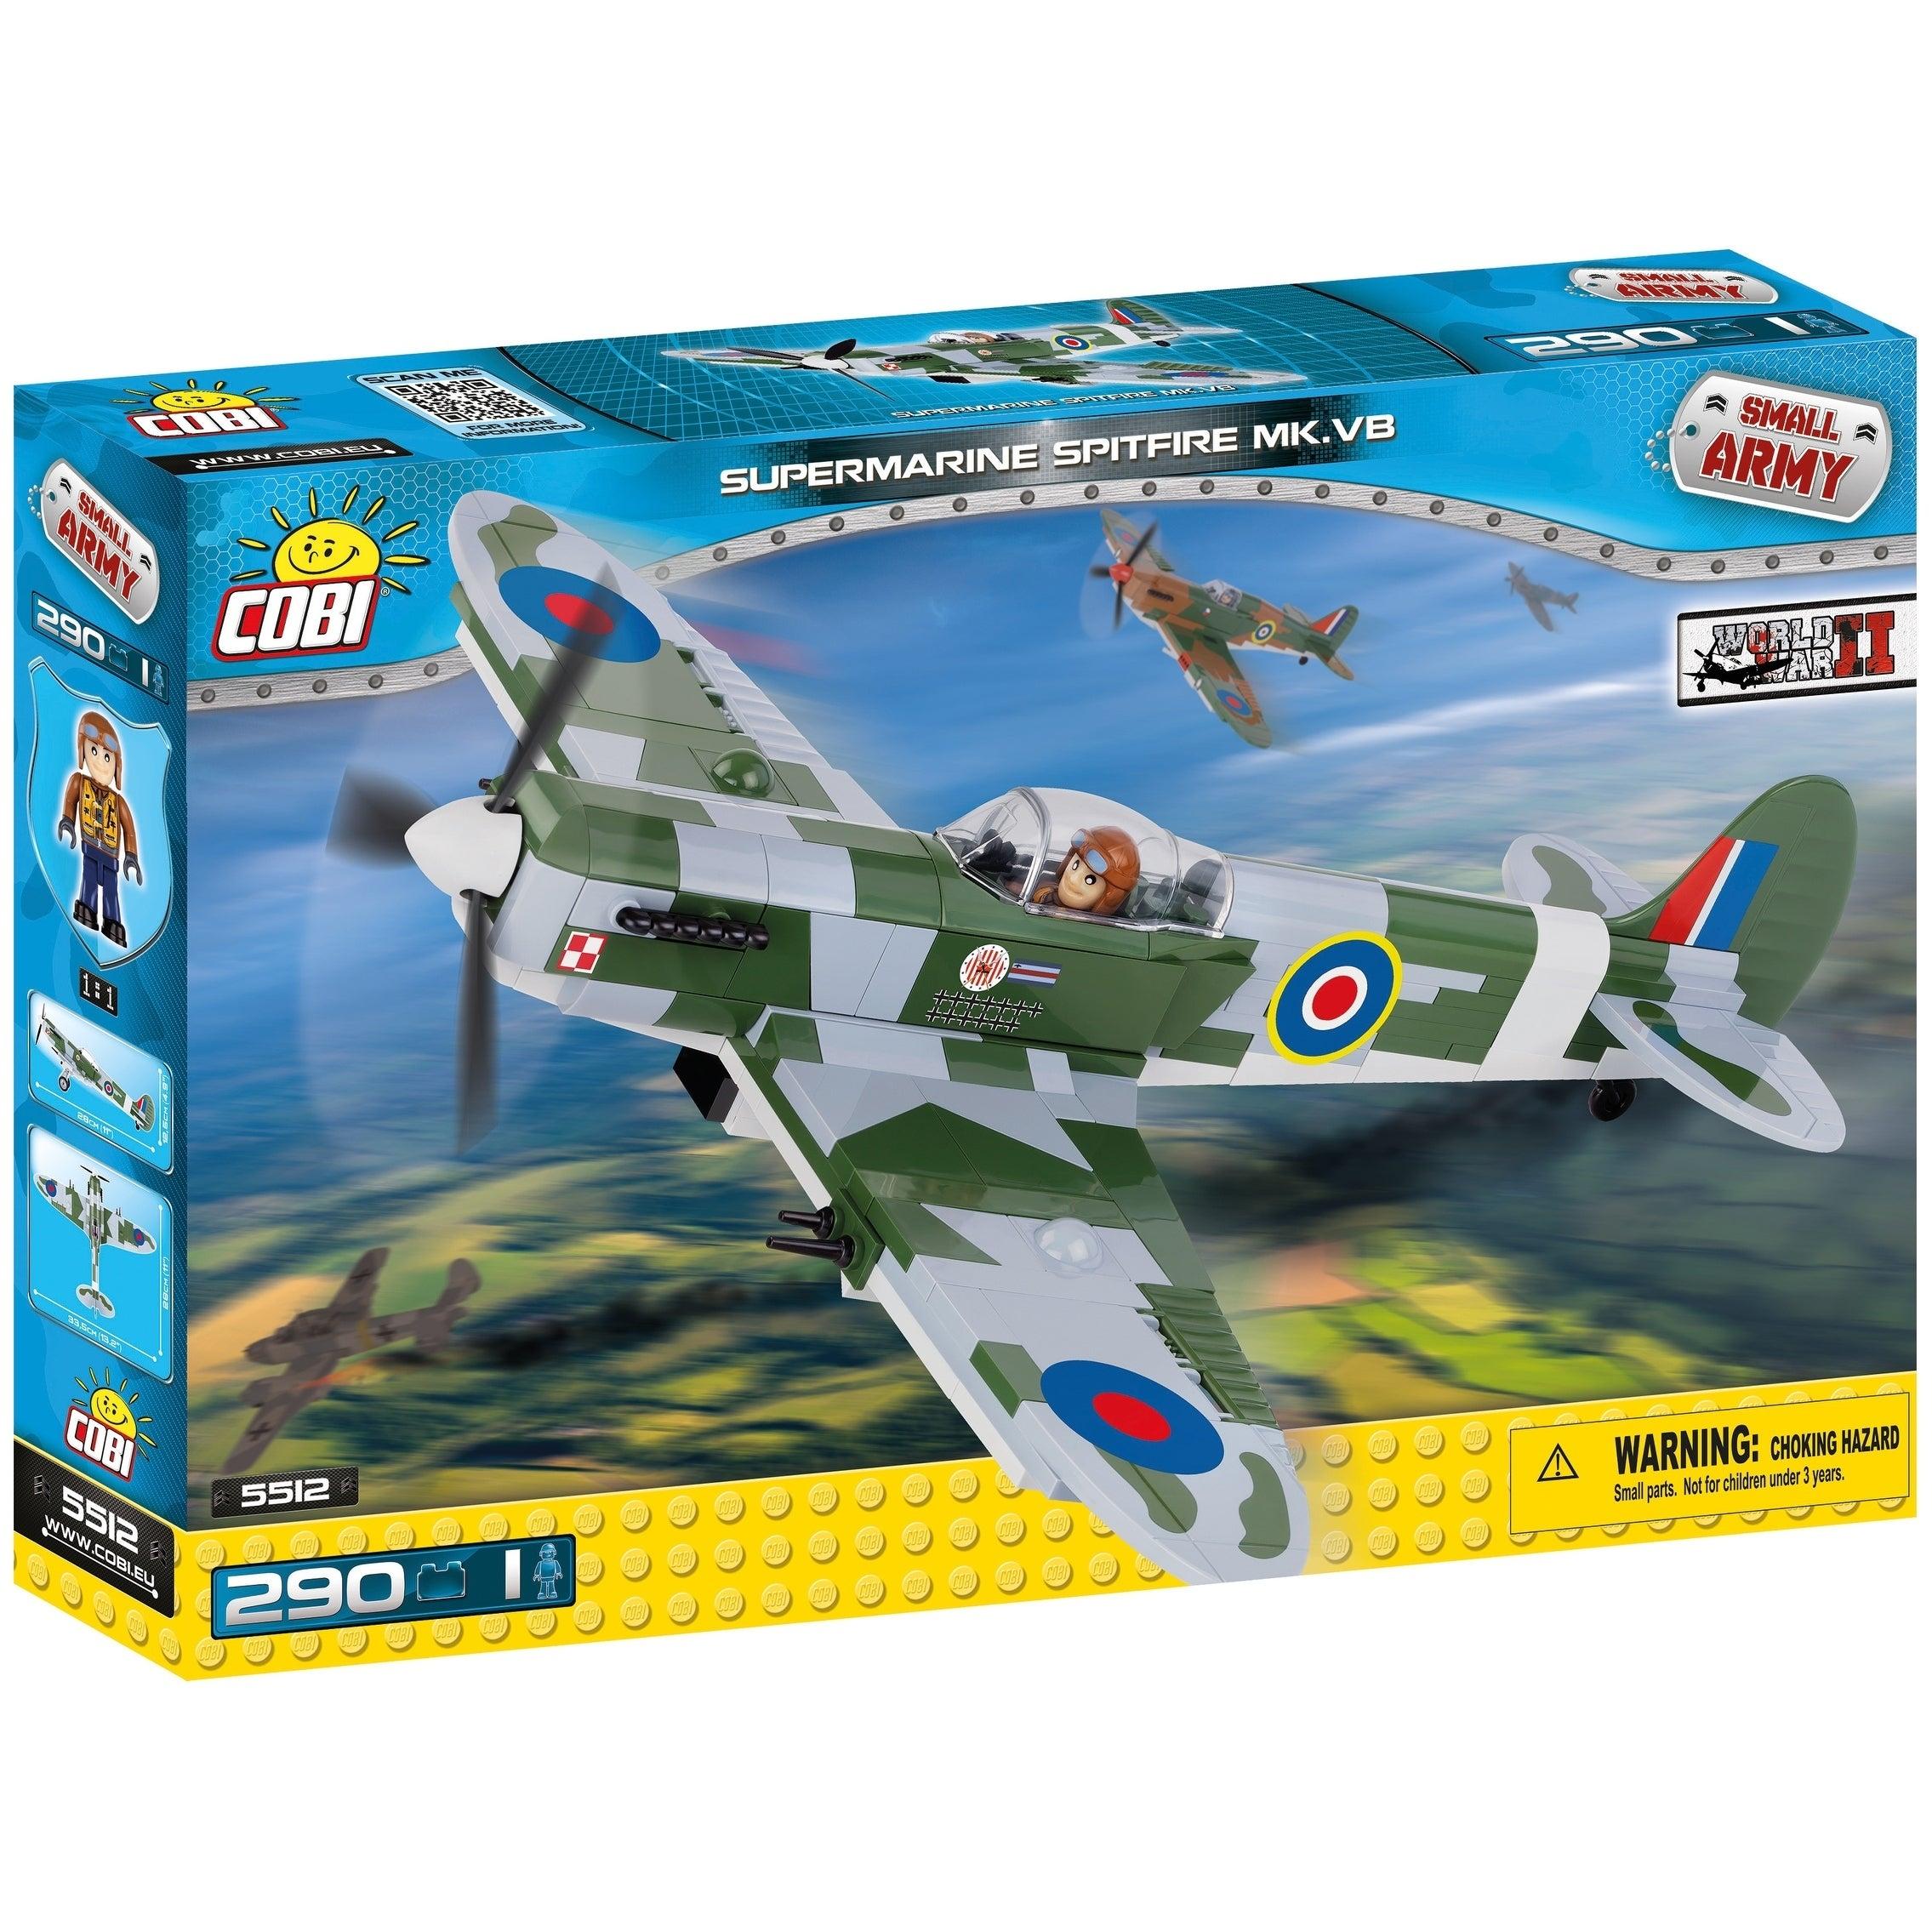 Cobi Toys Small Army World War II Supermarine Spitfire MK...